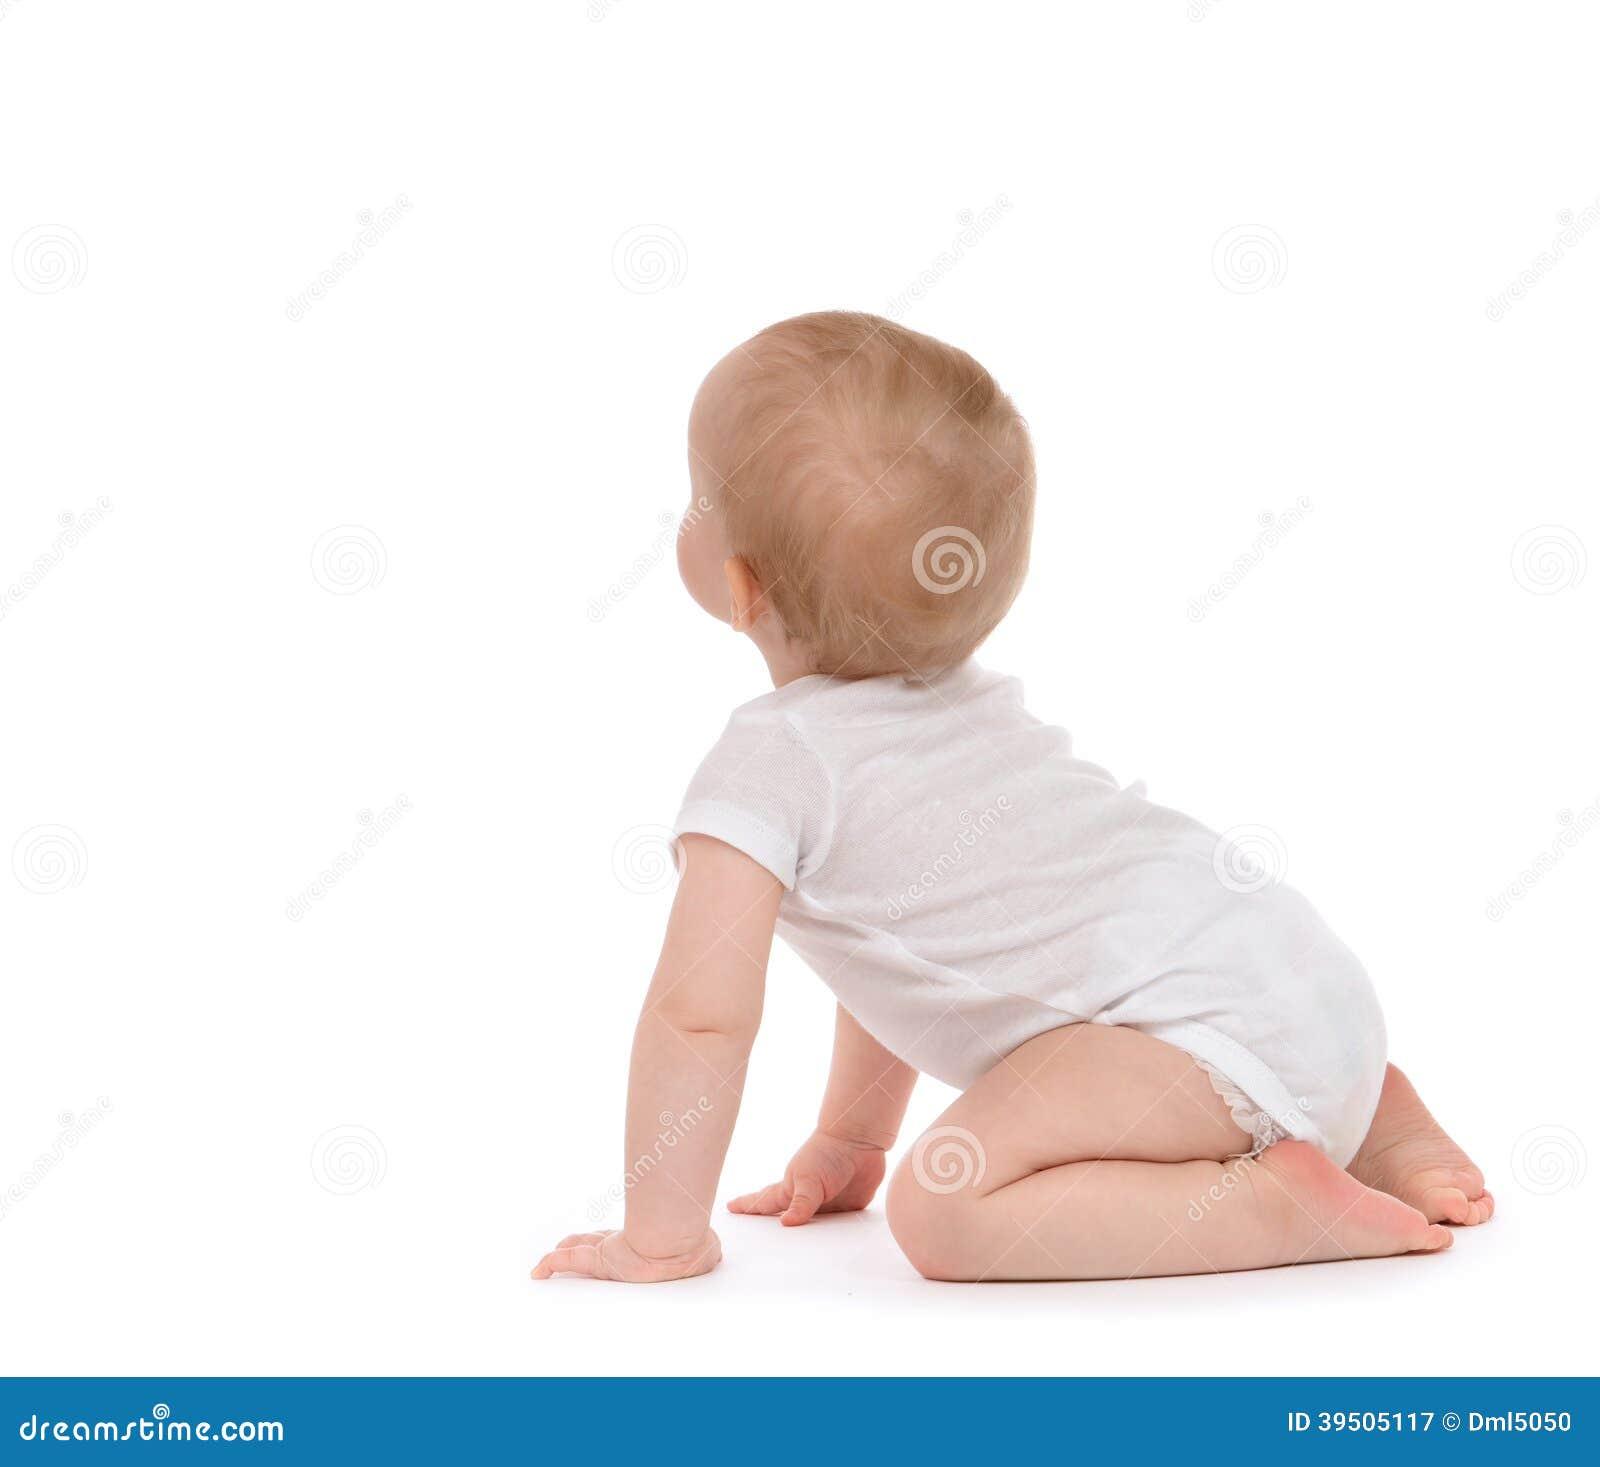 Child baby toddler sitting facing backwards back rear view